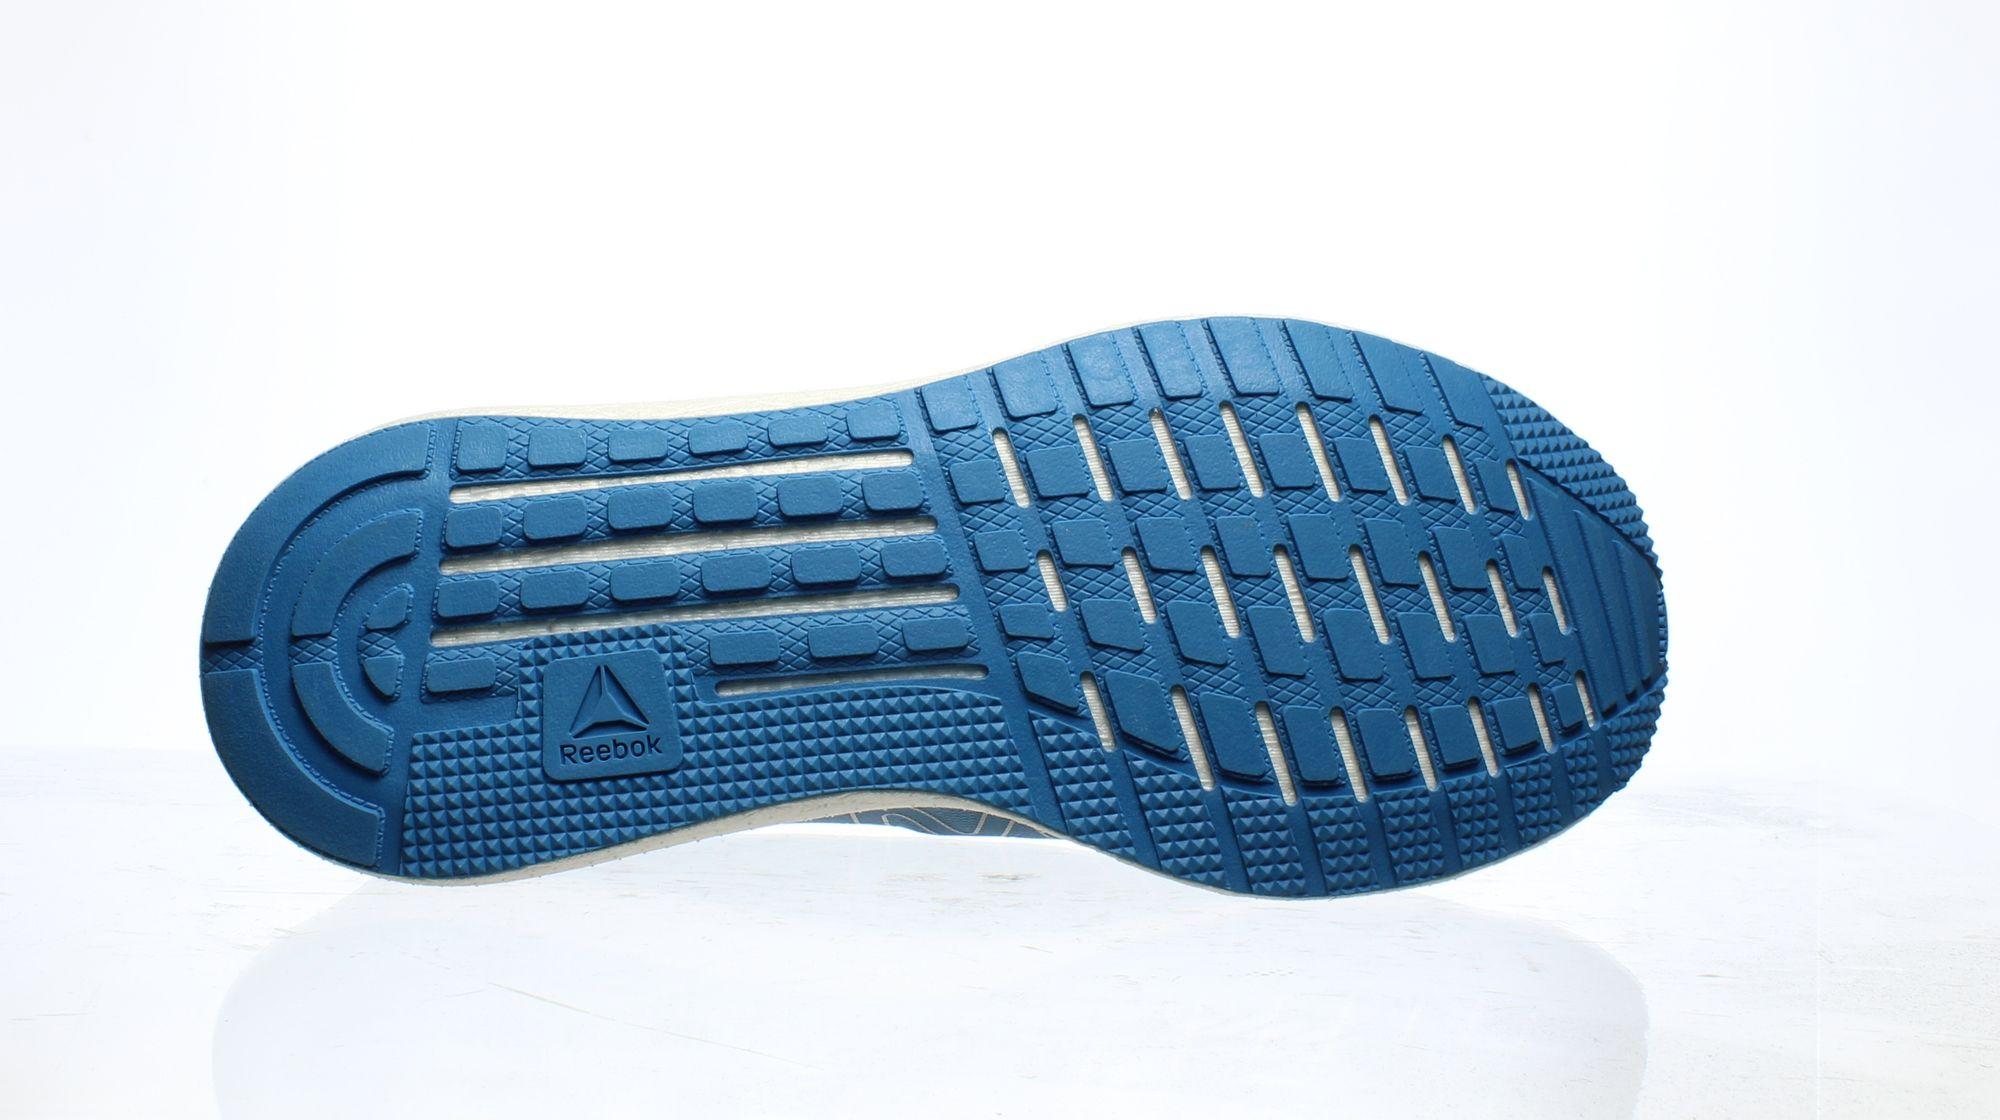 Reebok-Womens-Forever-Floatride-Energy-Running-Shoes thumbnail 17